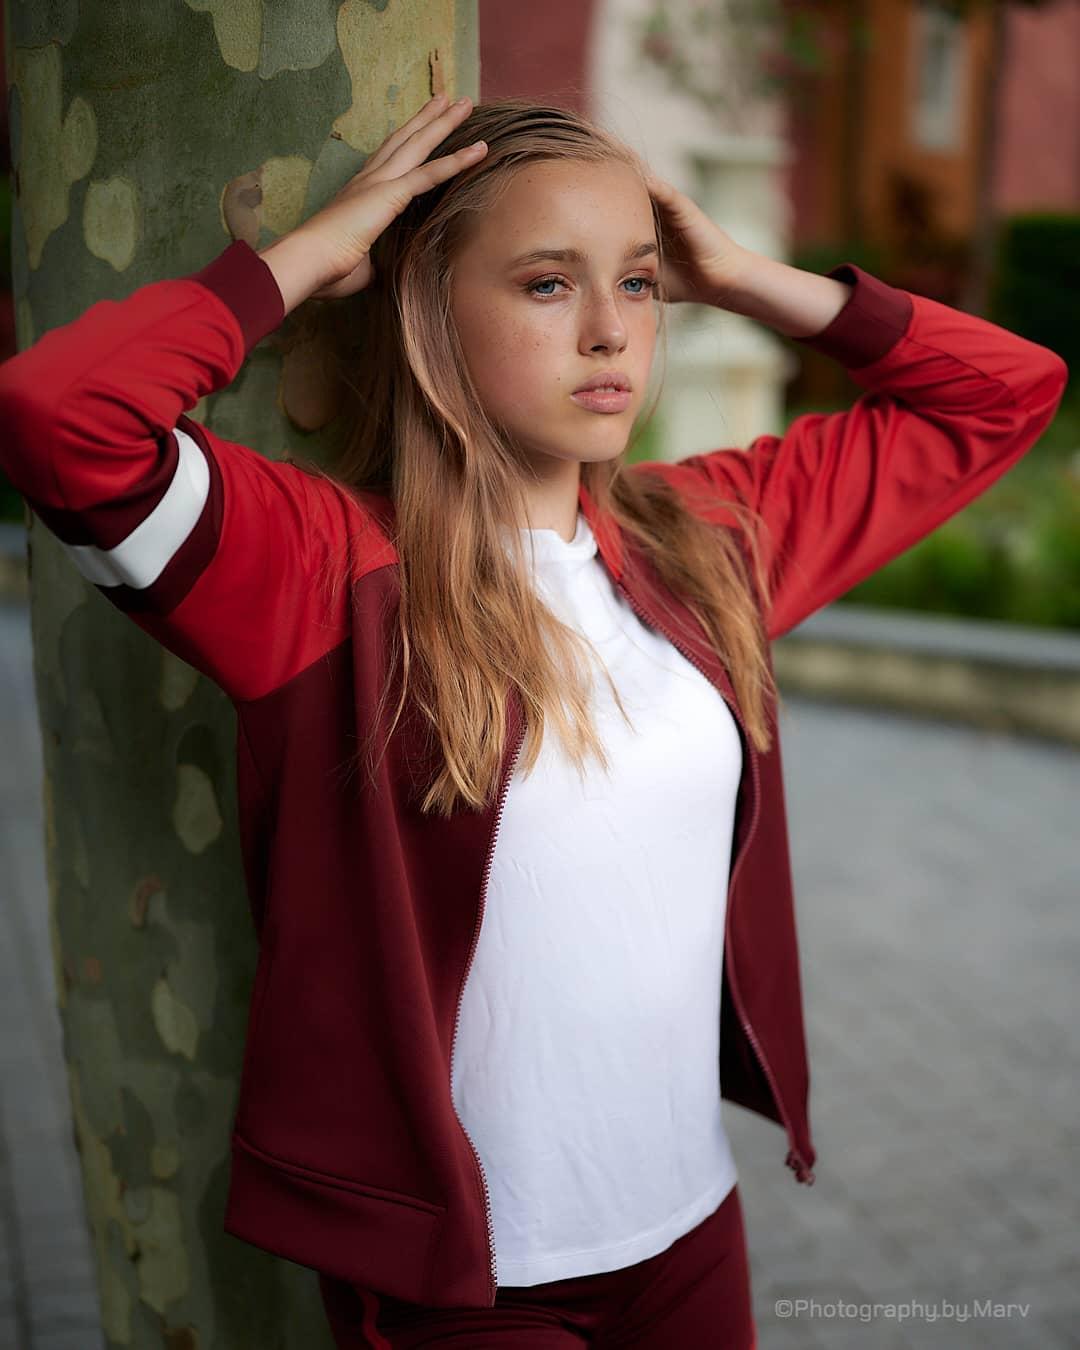 Emiliacheergirl-Wallpapers-Insta-Fit-Bio-Emilia-Danielle-Wallpapers-Insta-Fit-Bio-11